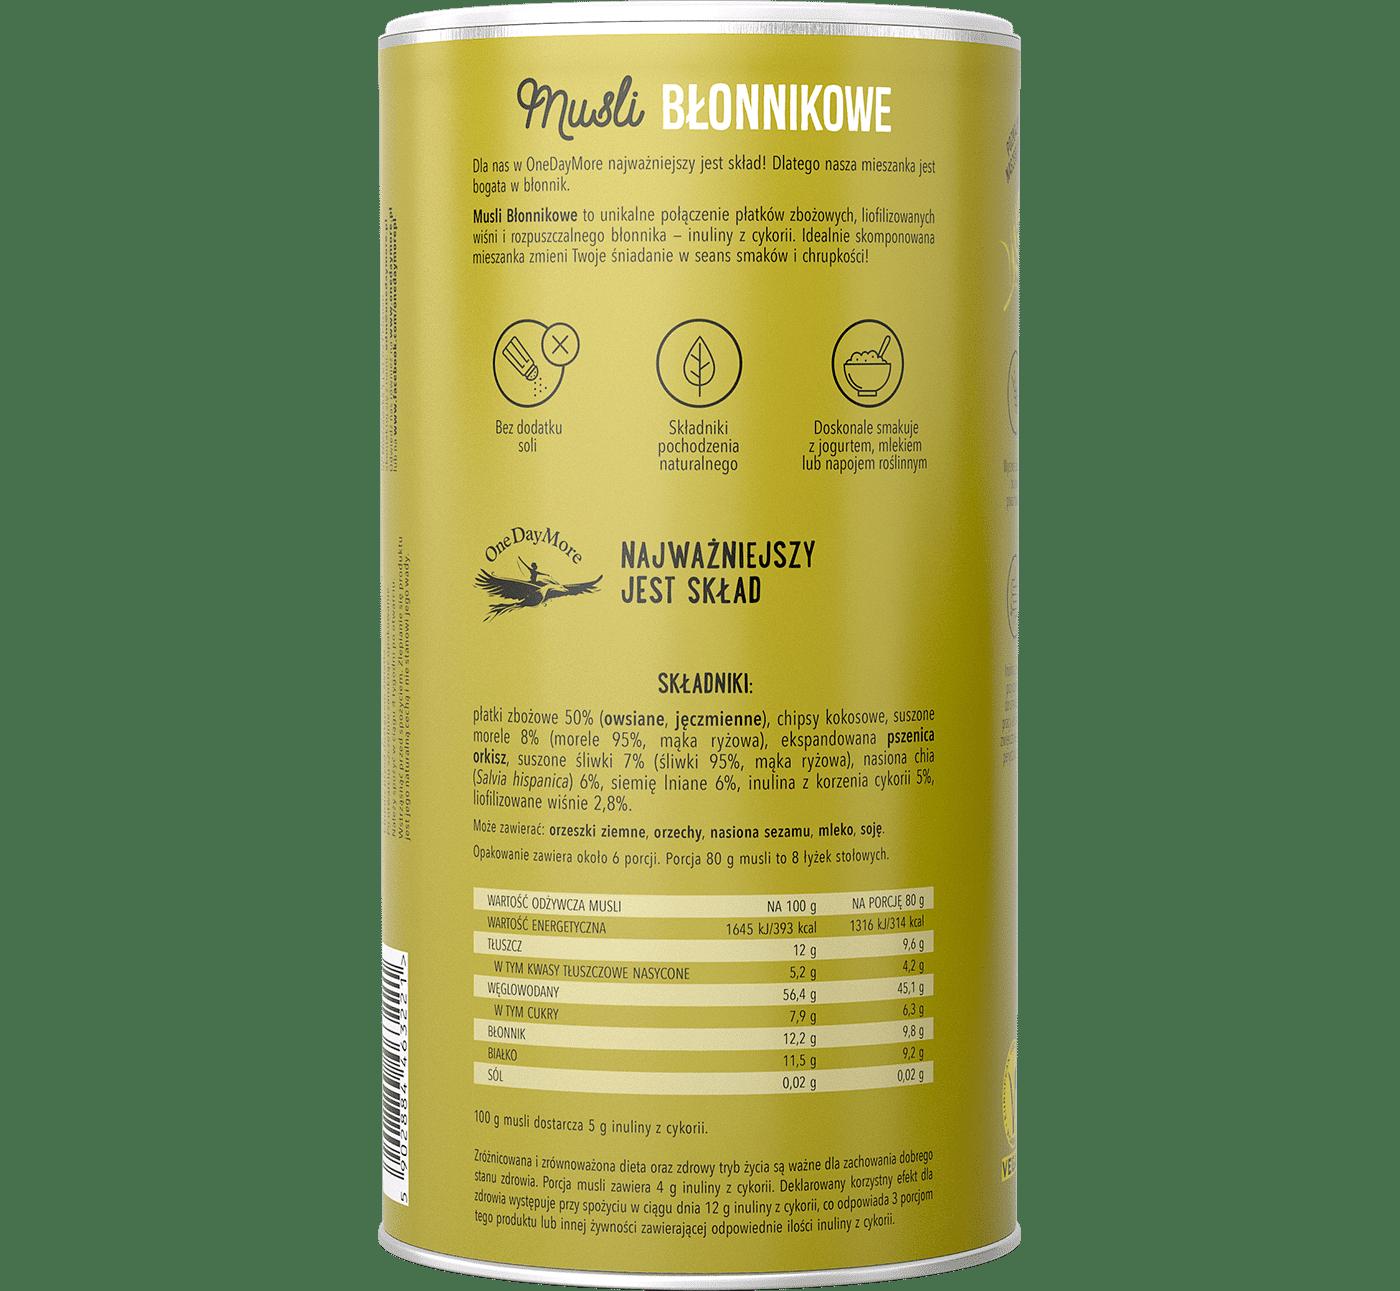 musli-blonnikowe-nowa-receptura-onedaymore-tyl-1400×1291